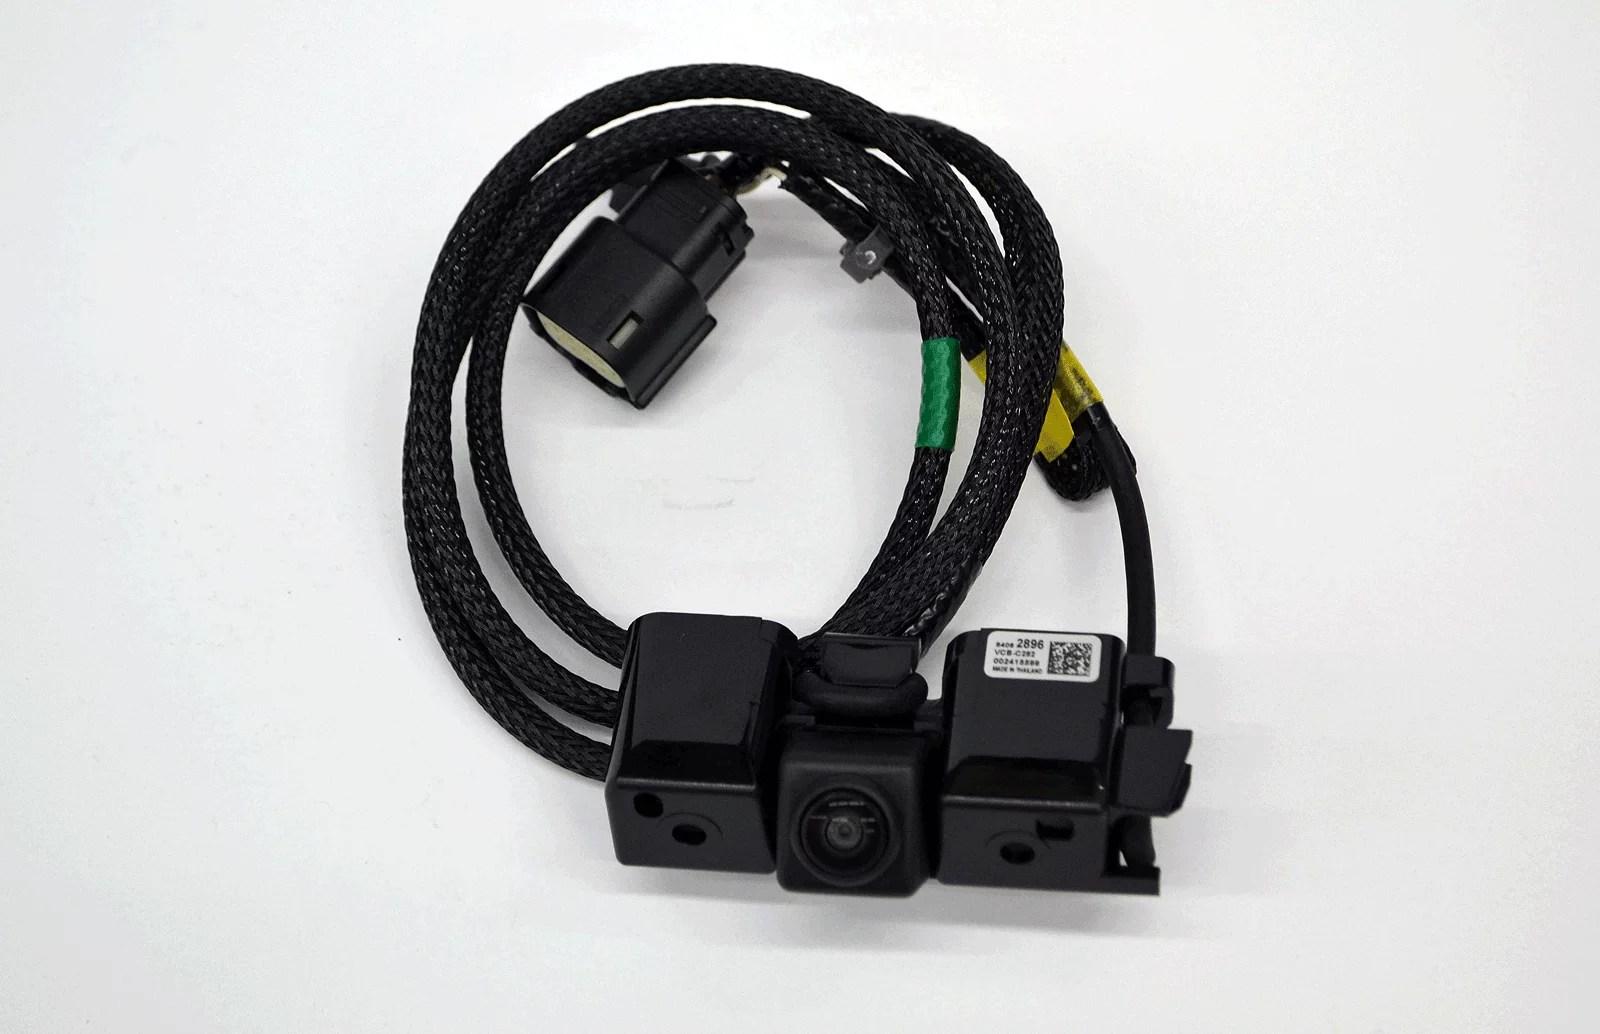 hight resolution of new gm oem rear view backup camera 2016 2017 silverado sierra ram backup camera wiring diagram wiring adapter backup camera 2017 sierra